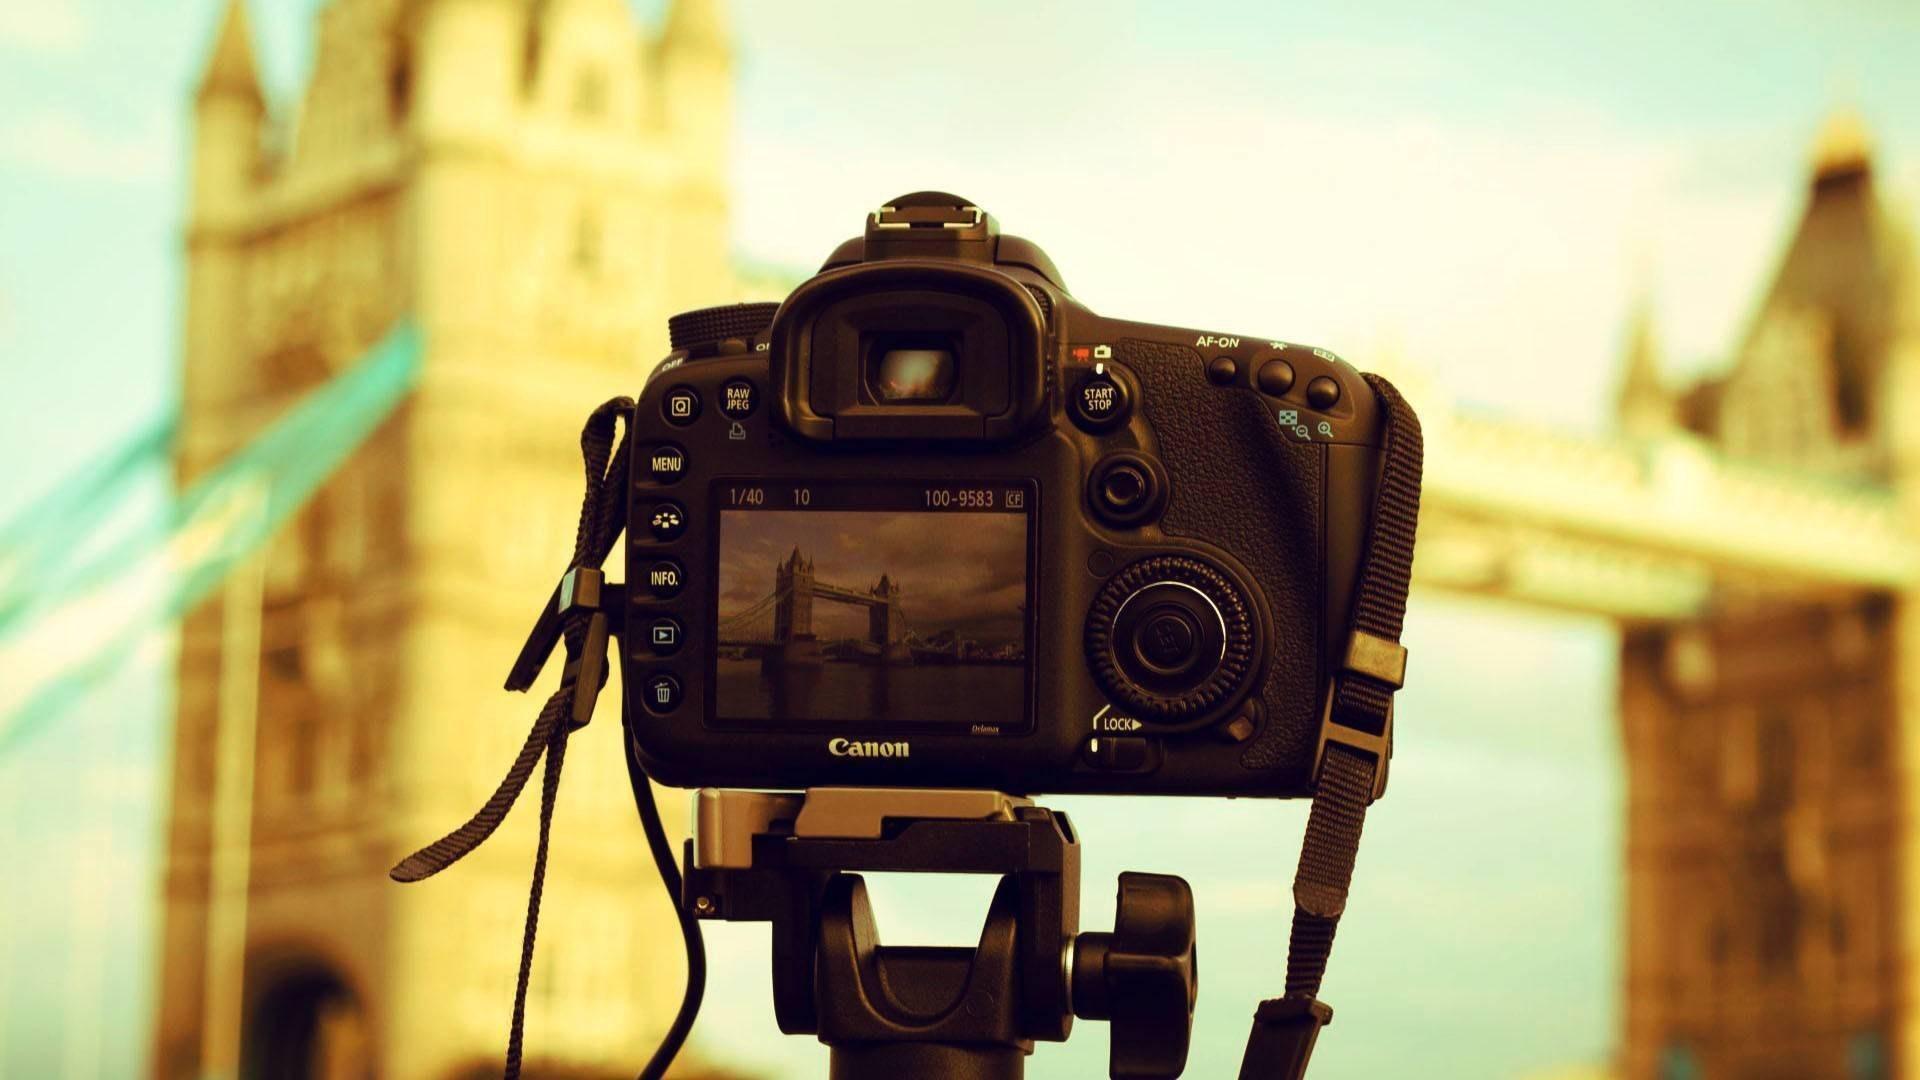 Camera Canon Tower Bridge London England Photo